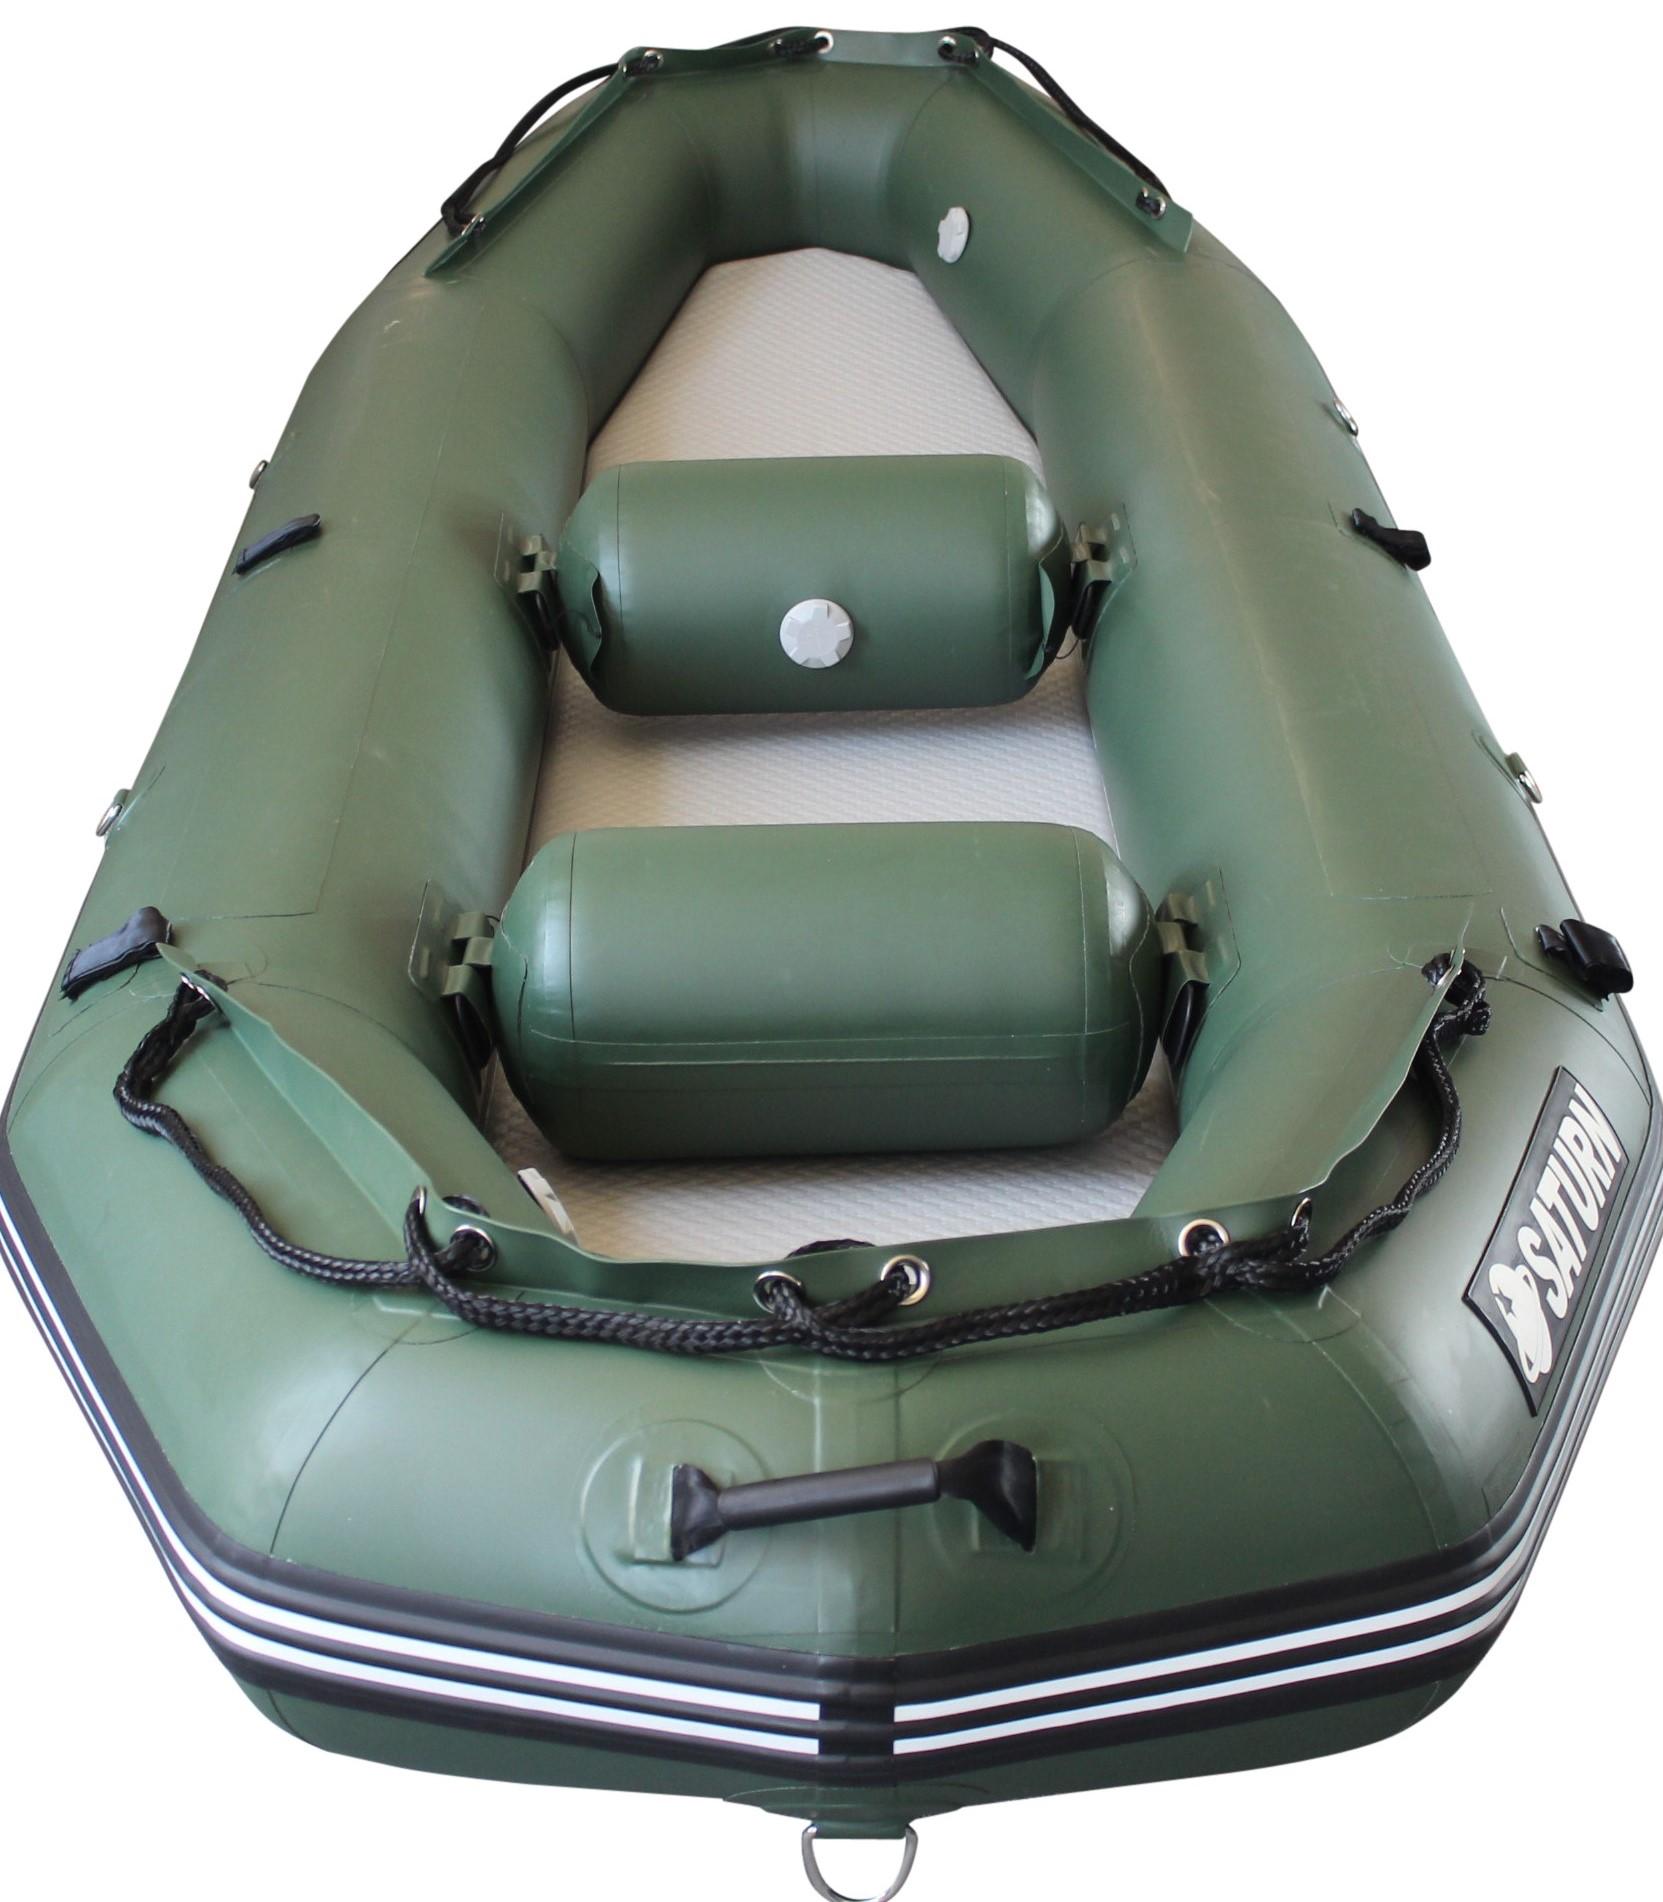 New 2020 12' Raft/Kayak RD365X